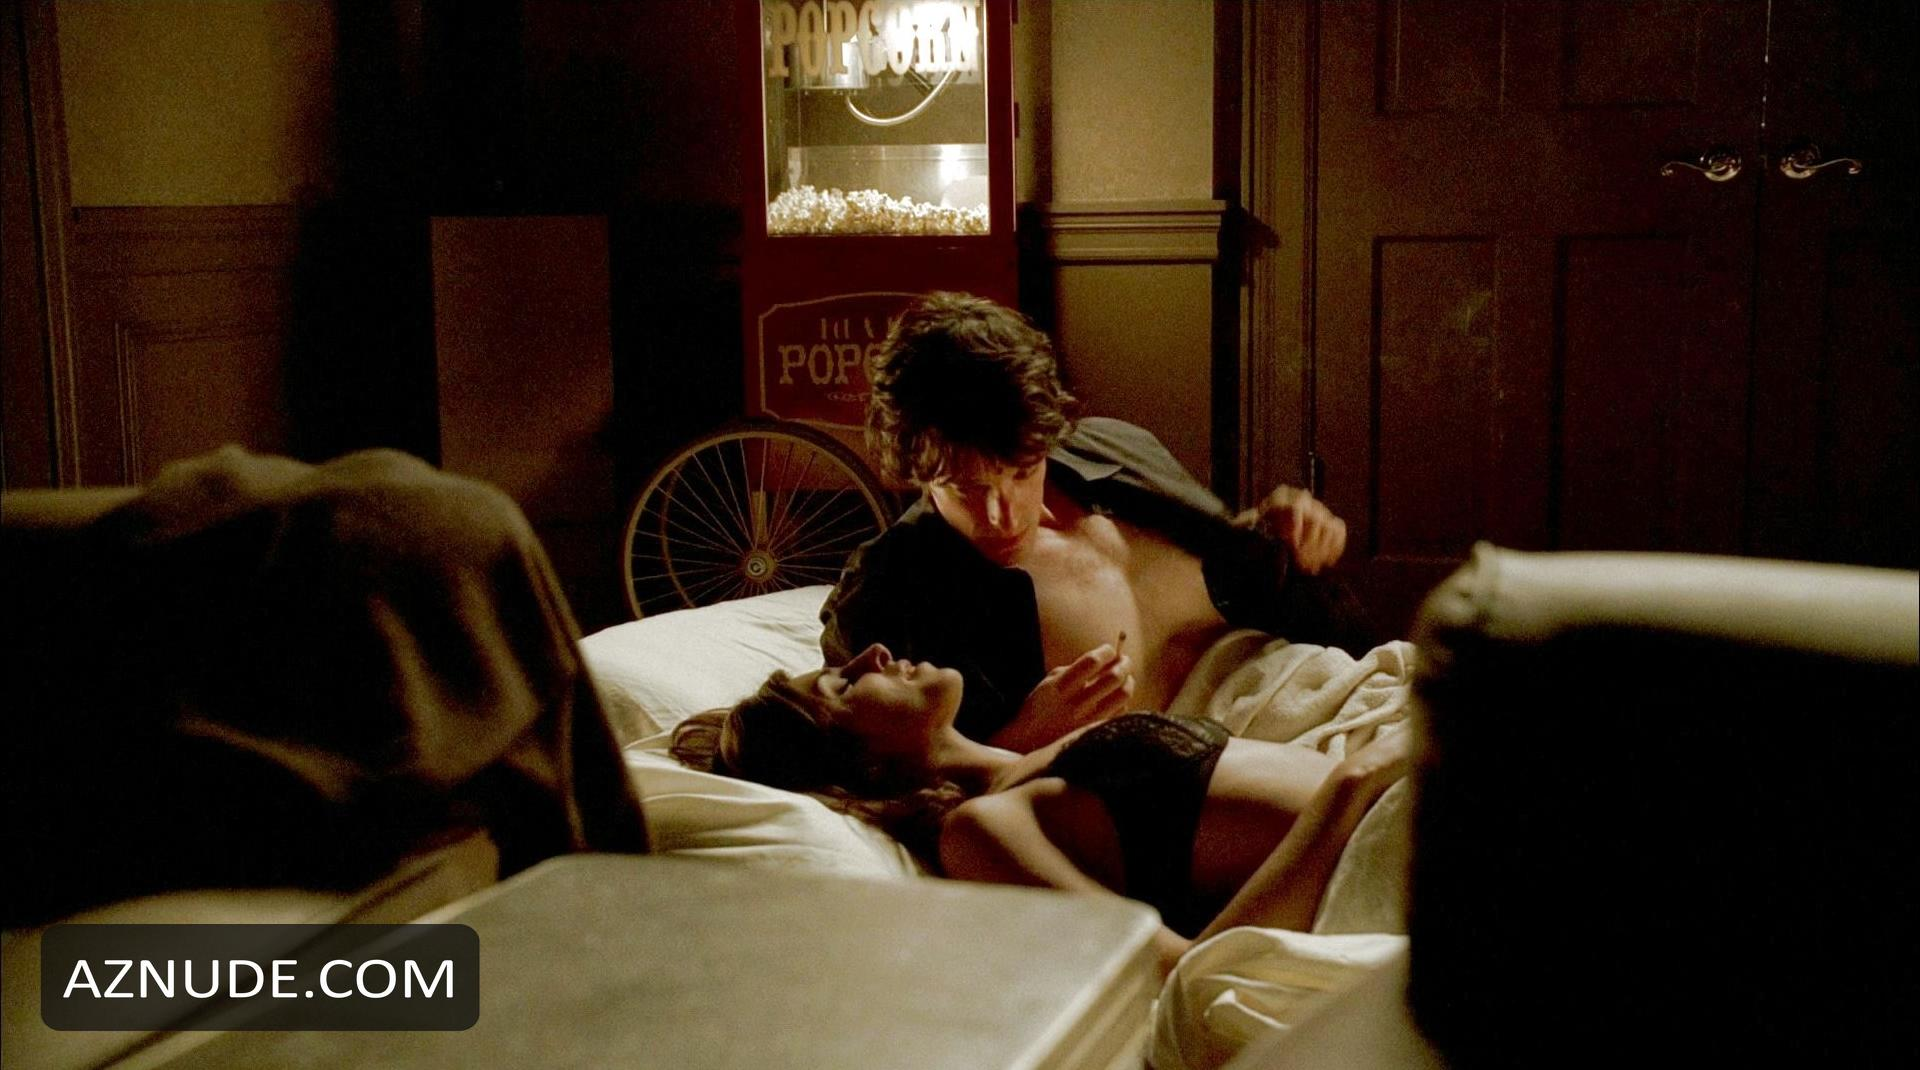 Jamie lynn desnudo pic